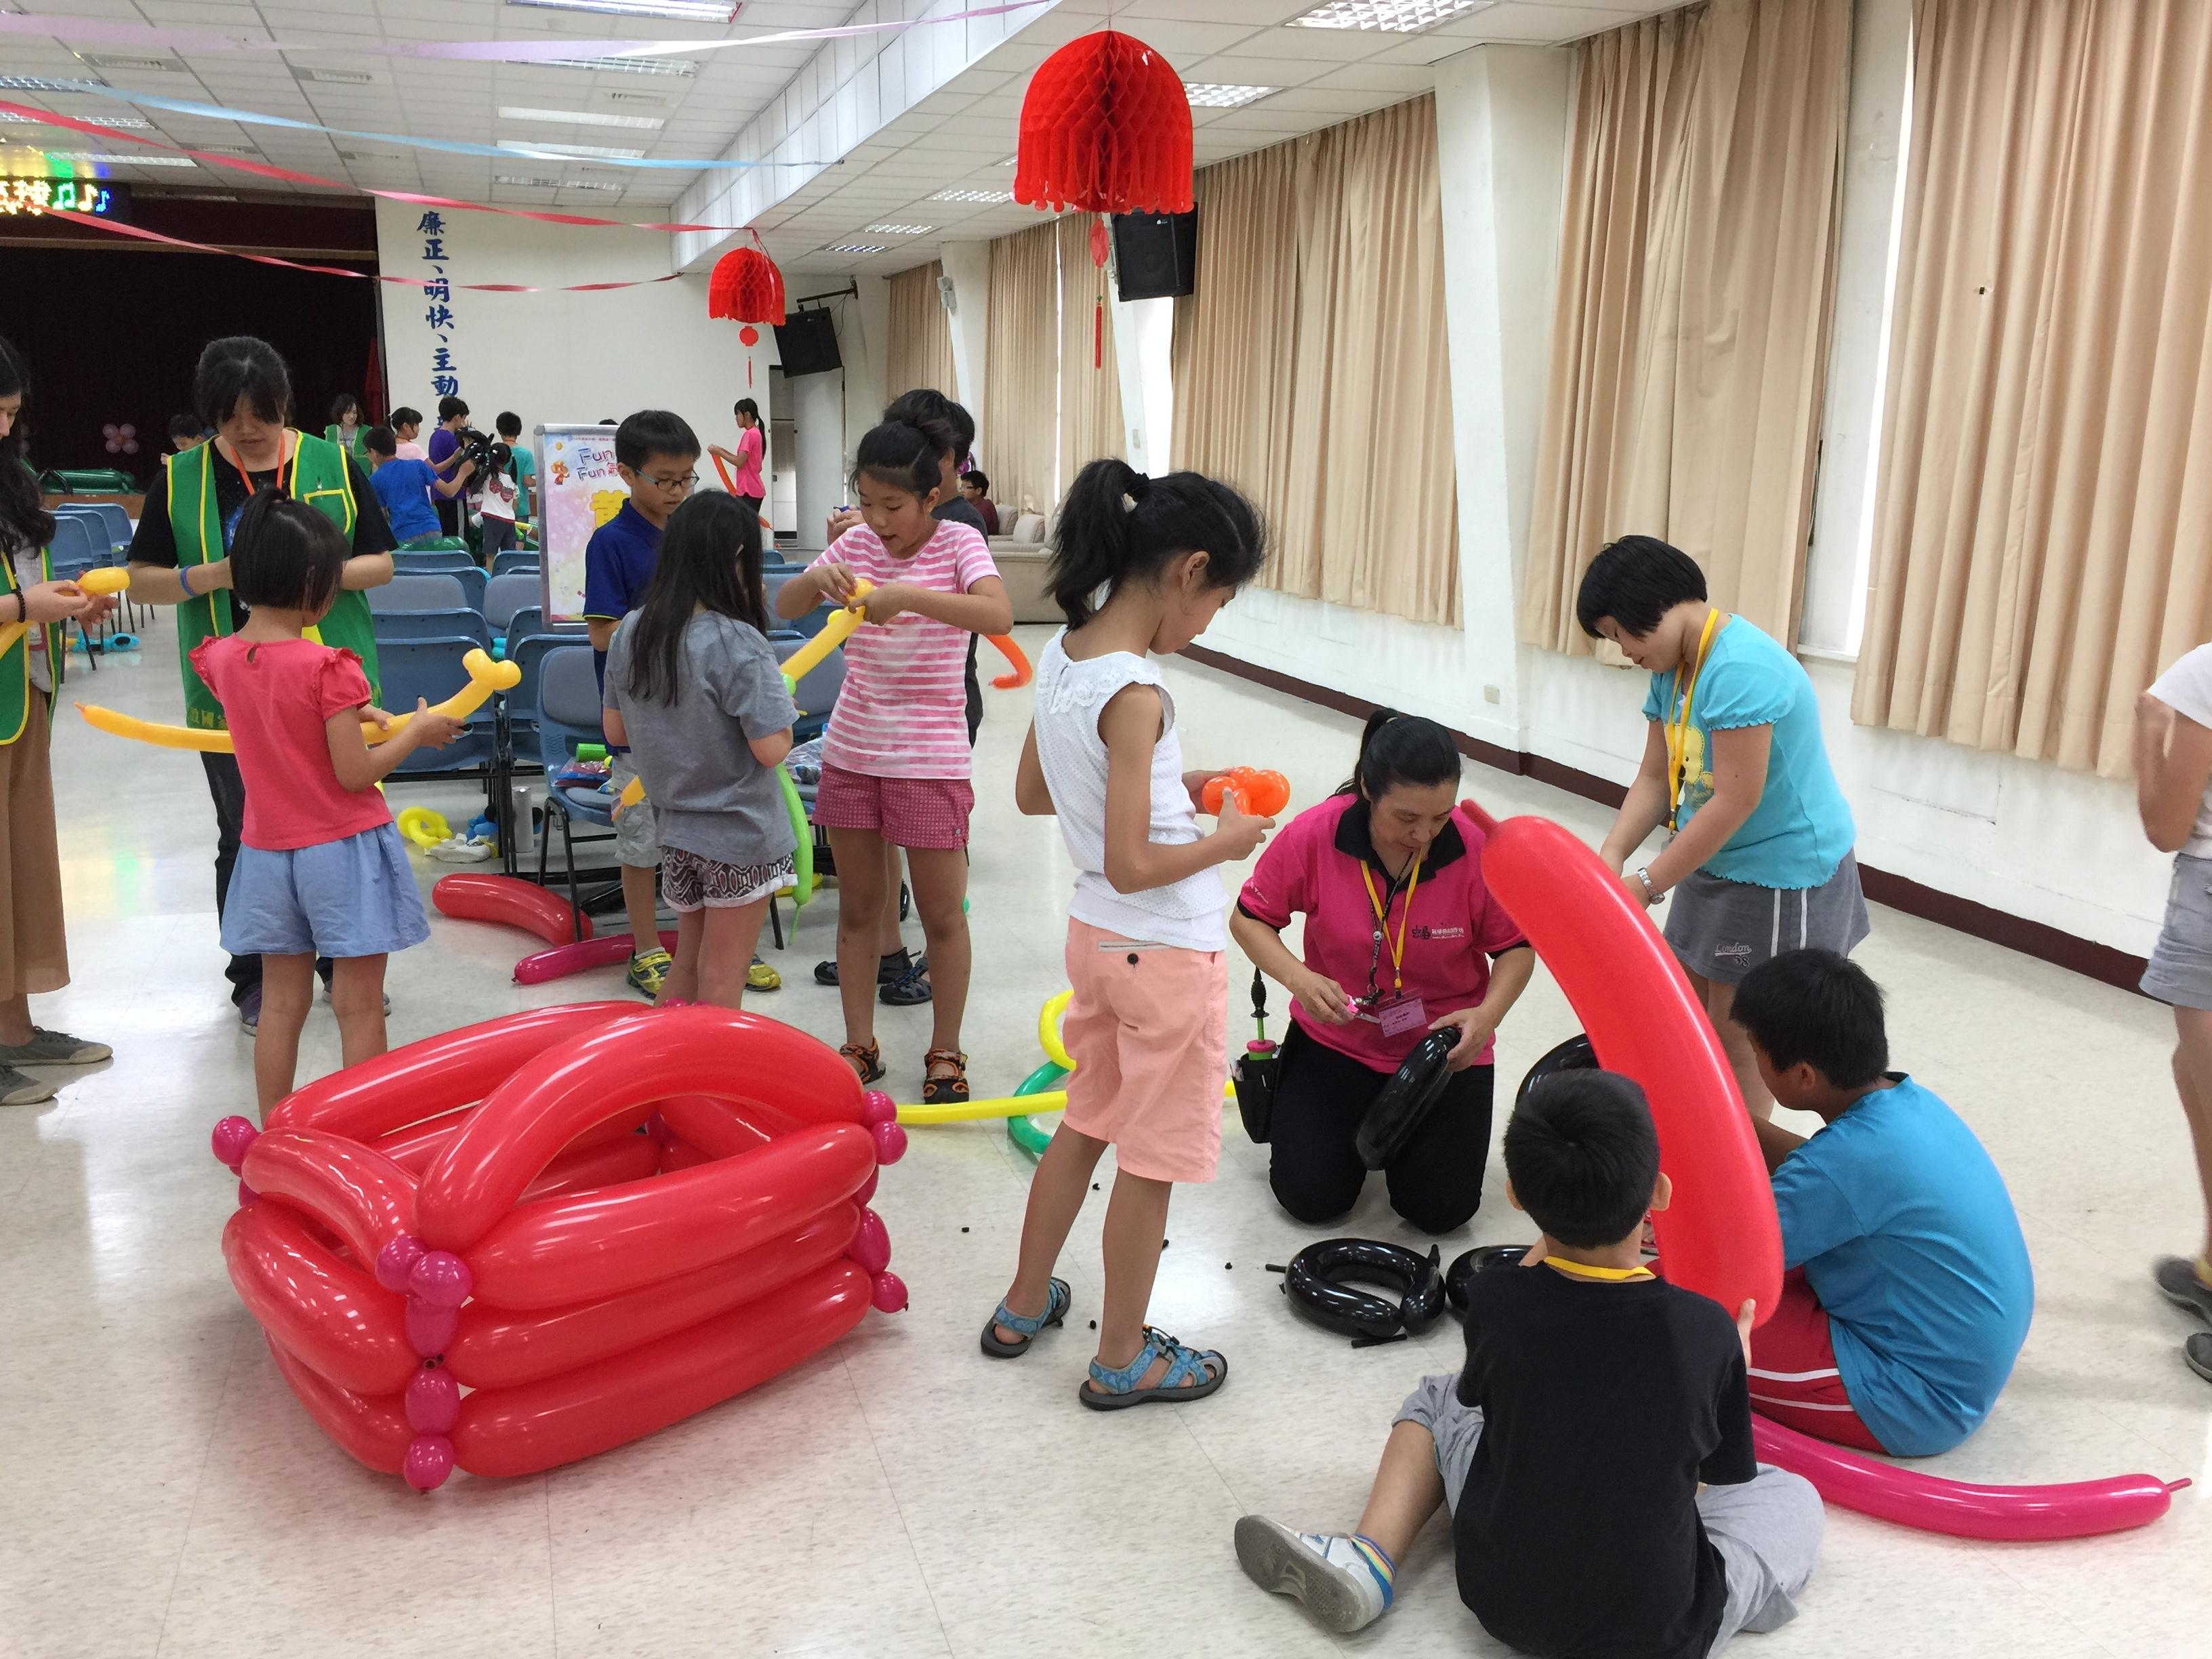 106Fun租稅Fun氣球活動照片17黃隊分組創作大型氣球汽車